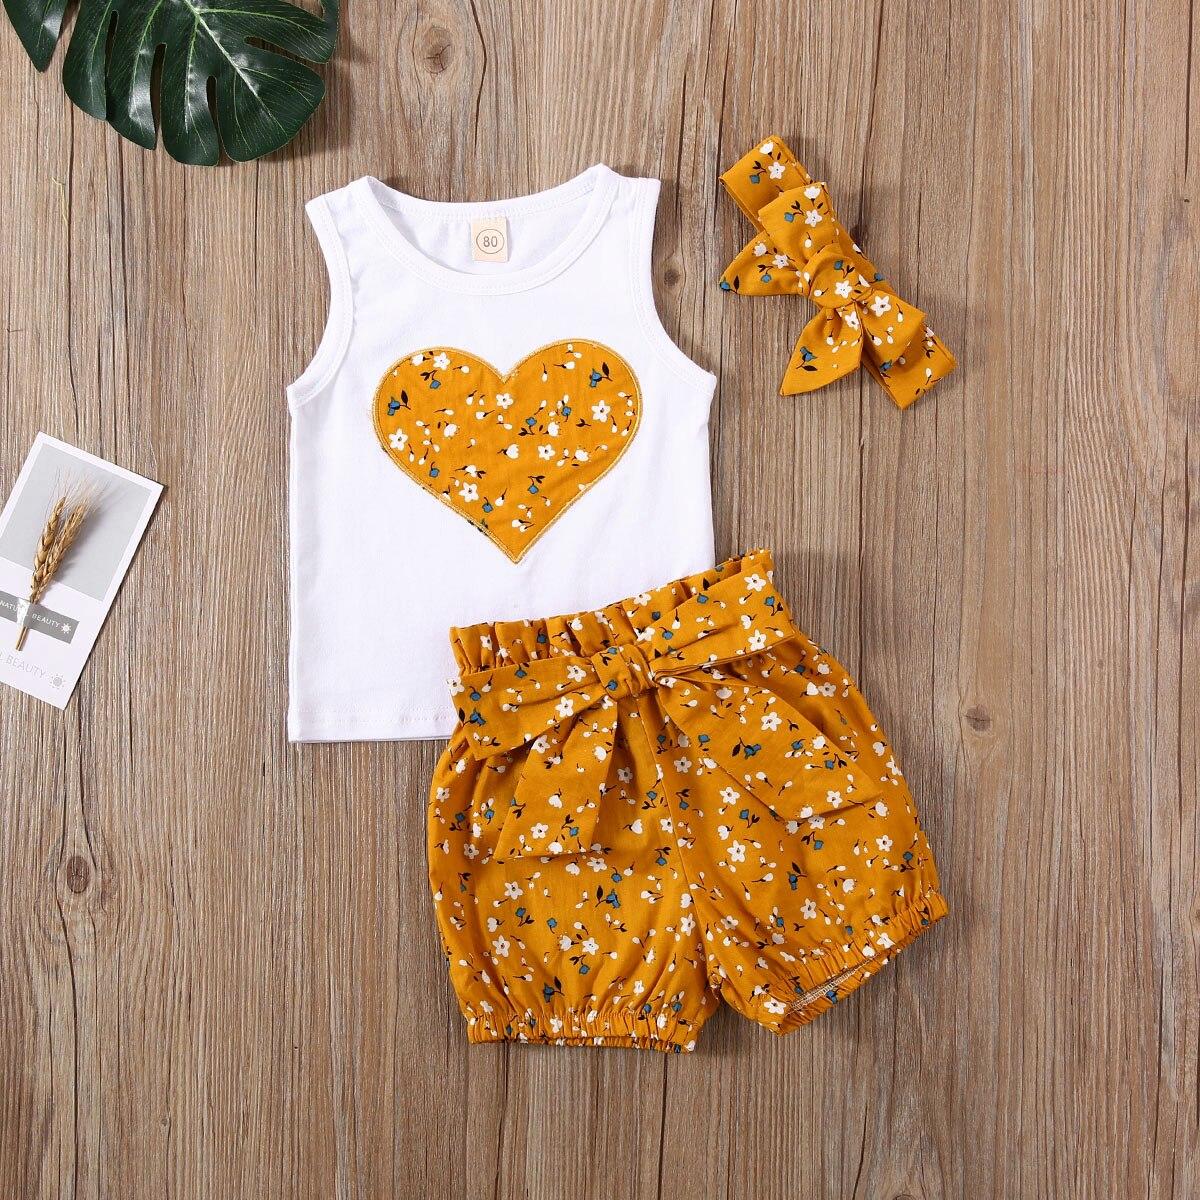 Emmababy Newborn Baby Girl Clothes Summer Flower Print Peach Heart Sleeveless Tops Short Pants Headband 3Pcs Outfits Sunsuit